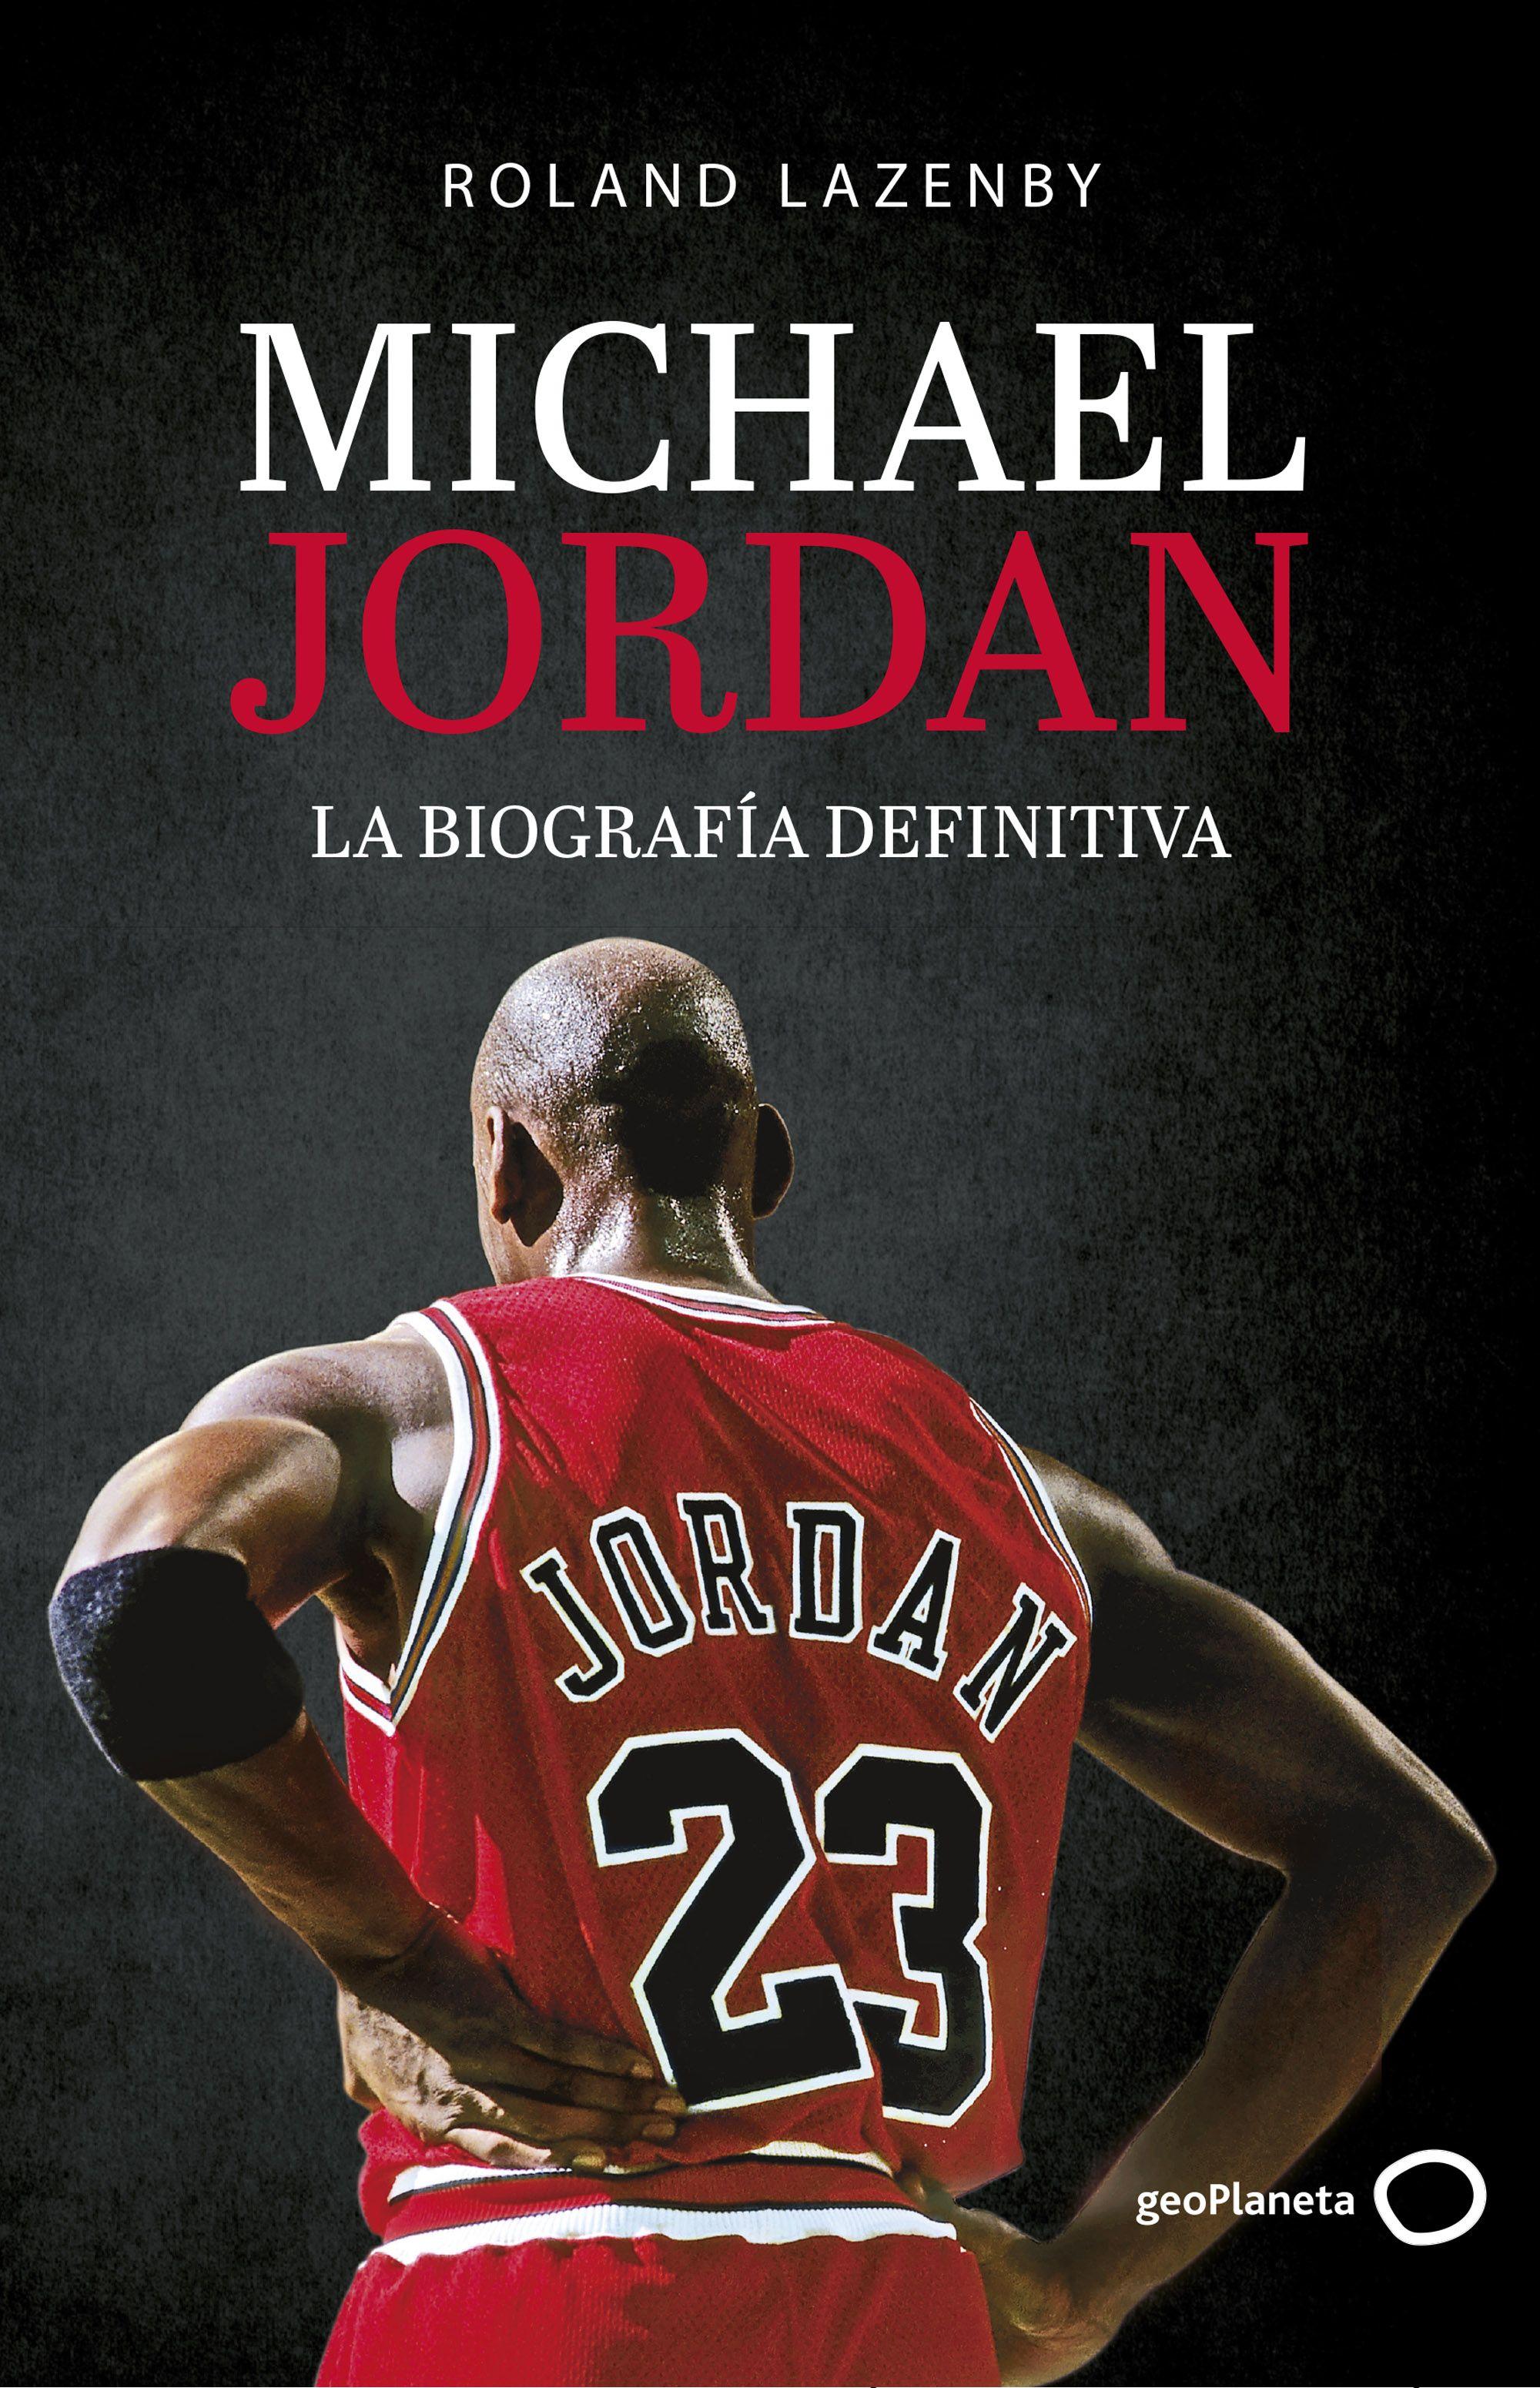 Michael Jordan. La Biografía Definitiva - Lazenby Roland